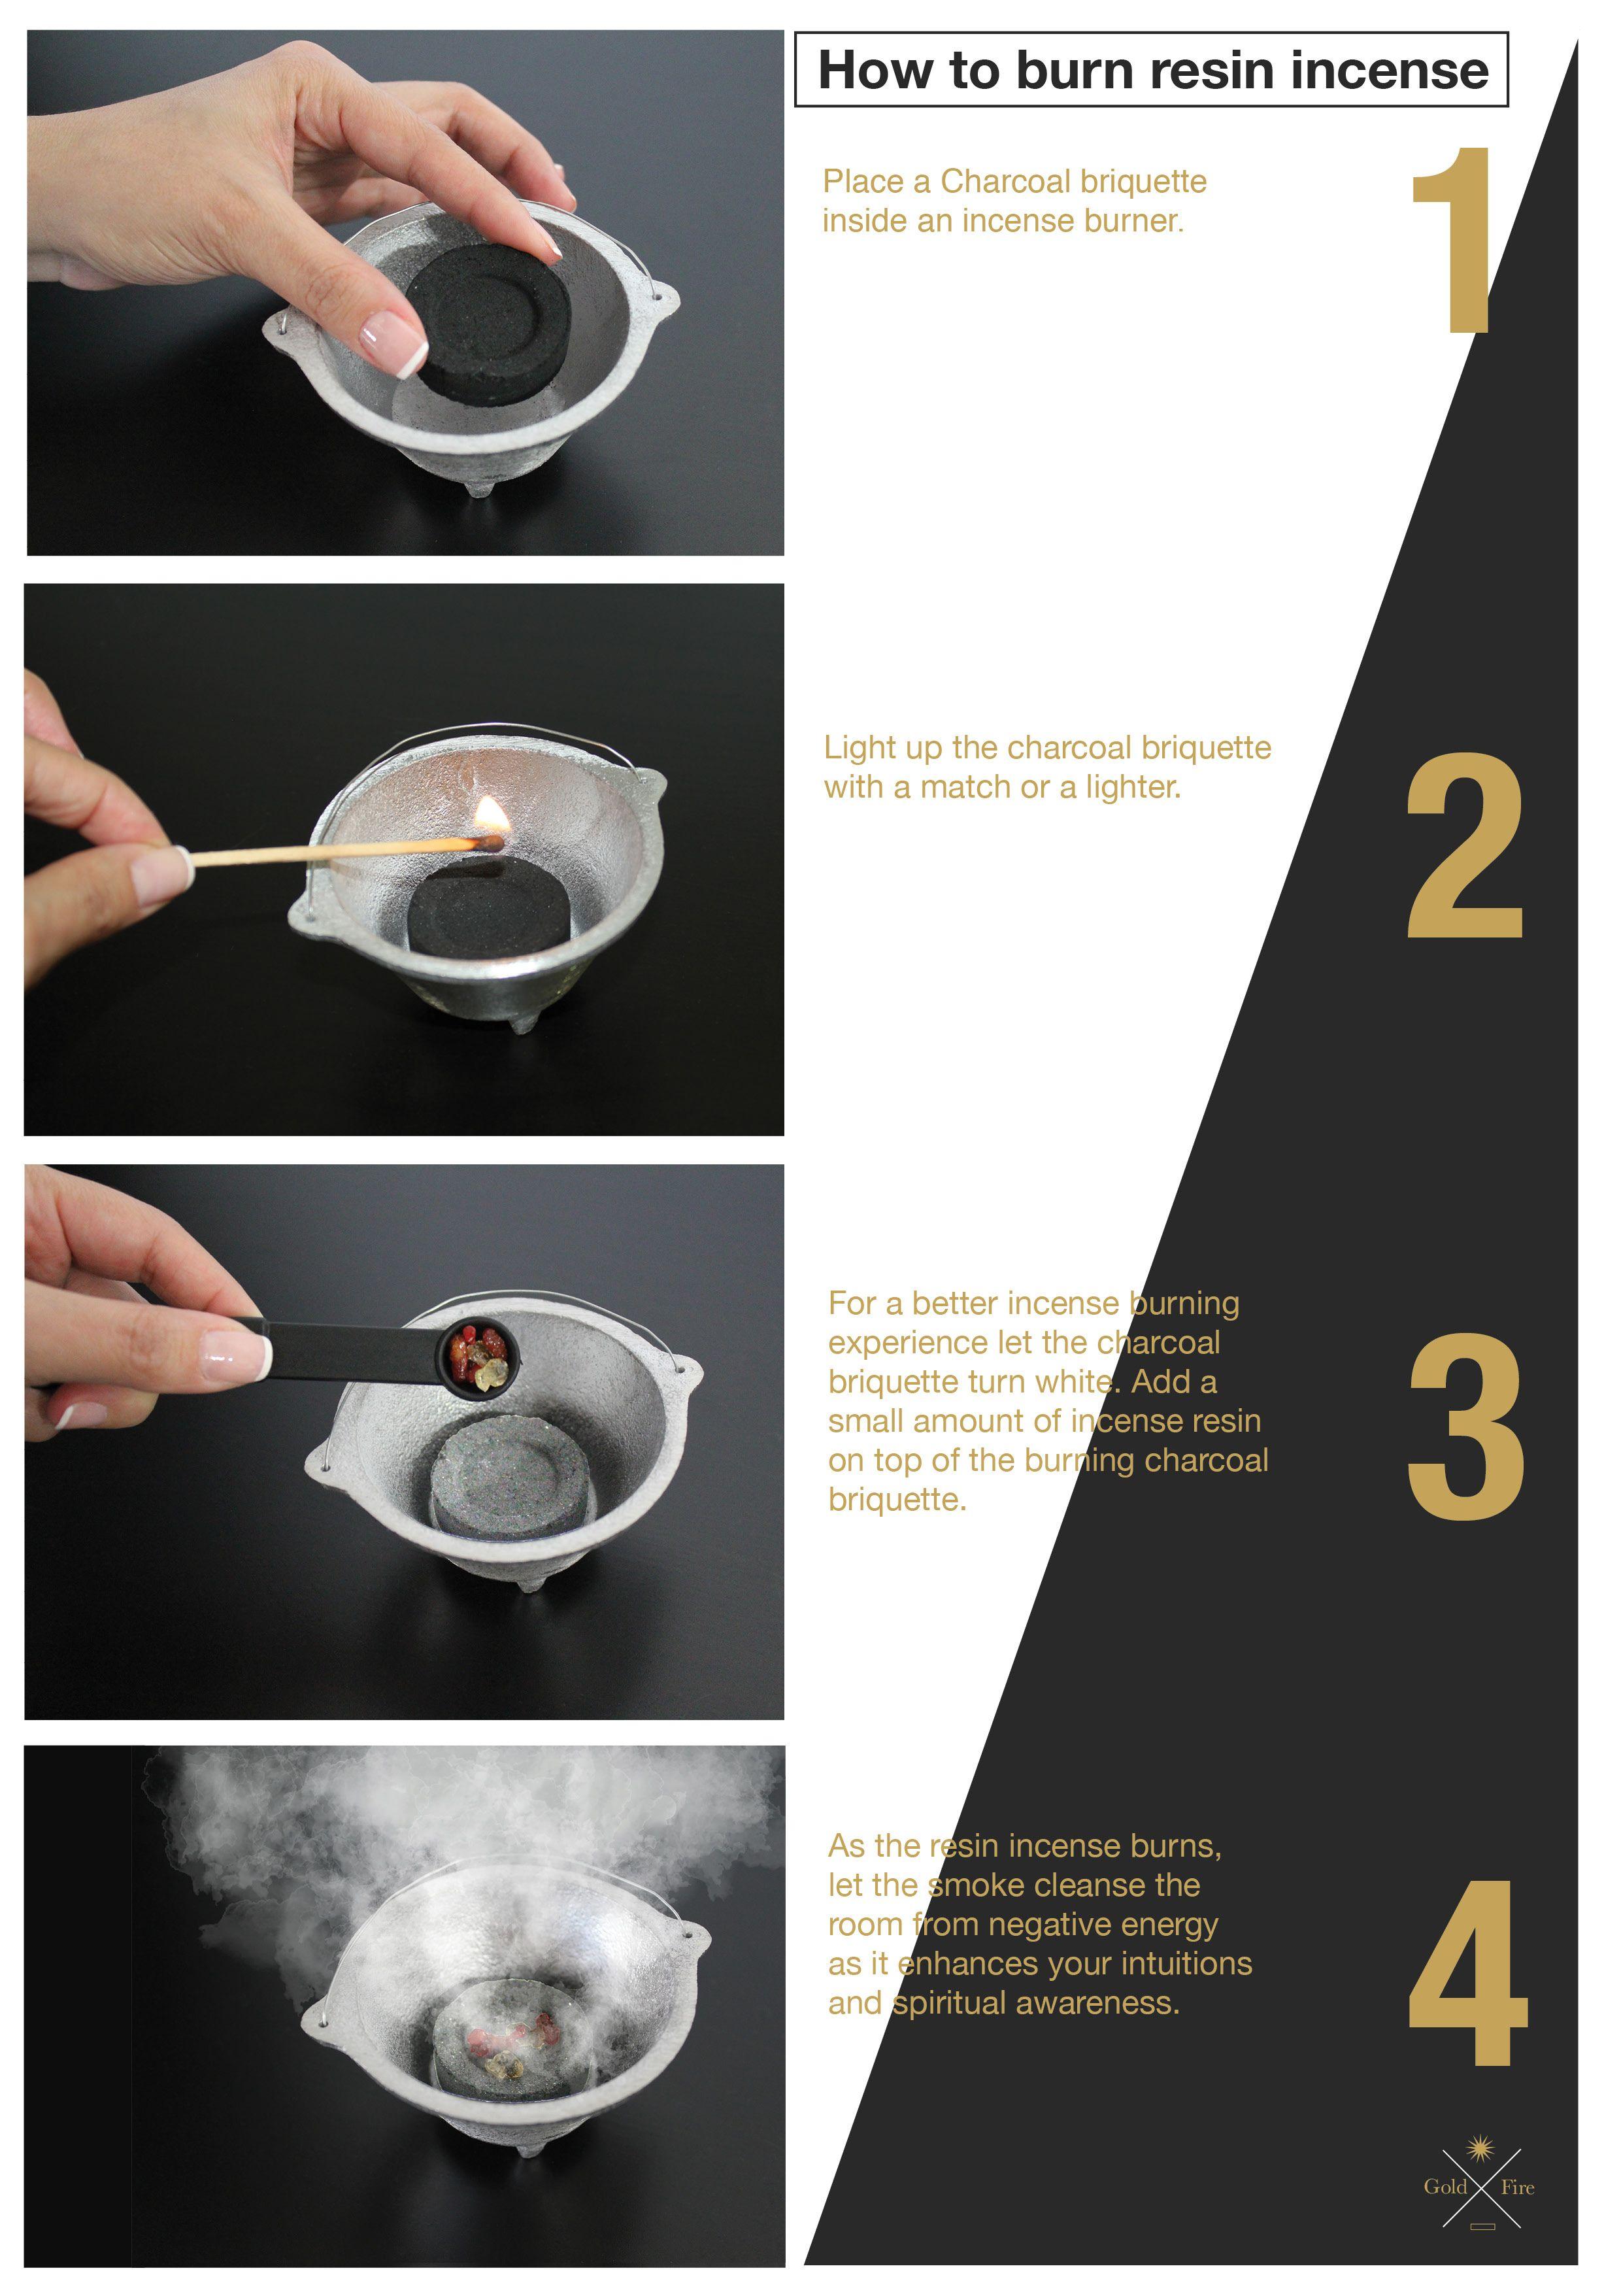 4 Easy Steps To Burn Resin Incense. Frankincense resin